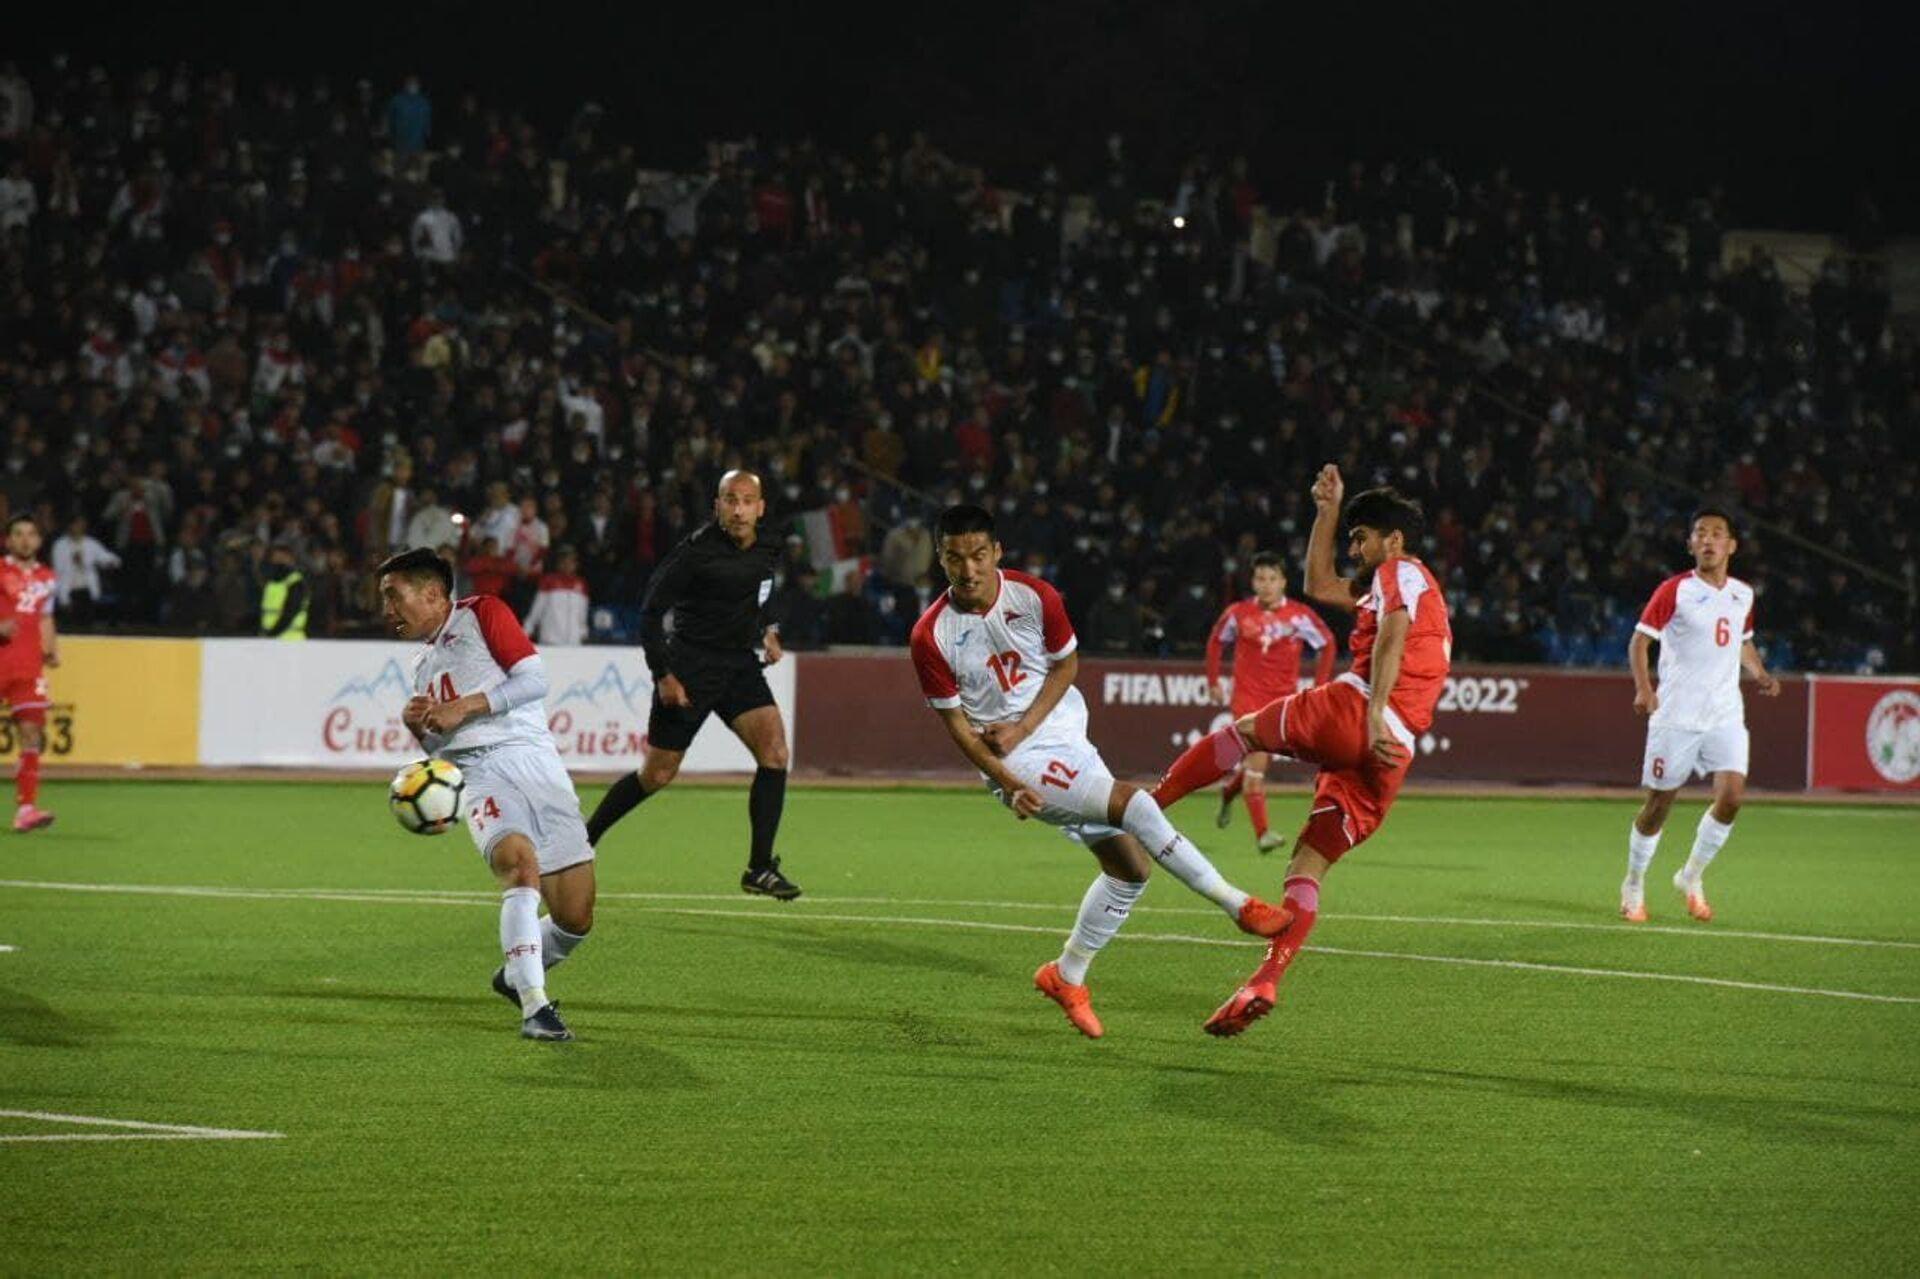 Отборочный матч Таджикистан - Монголия на ЧМ-2022 - Sputnik Таджикистан, 1920, 06.04.2021